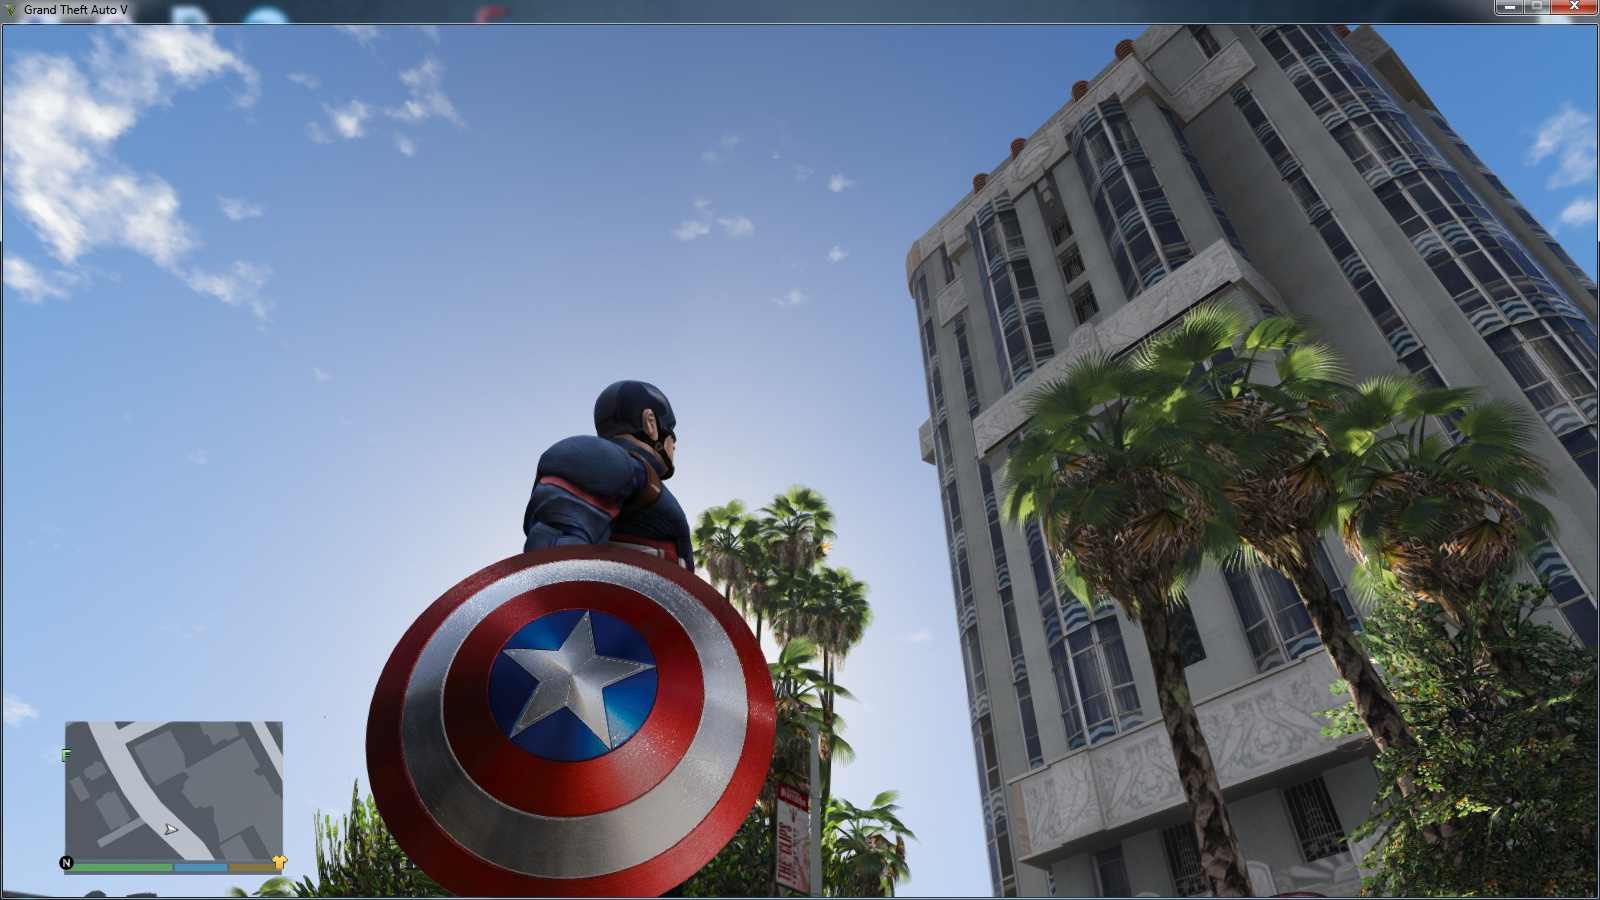 Marvel Captain America Shield 4k Gta5 Mods Com